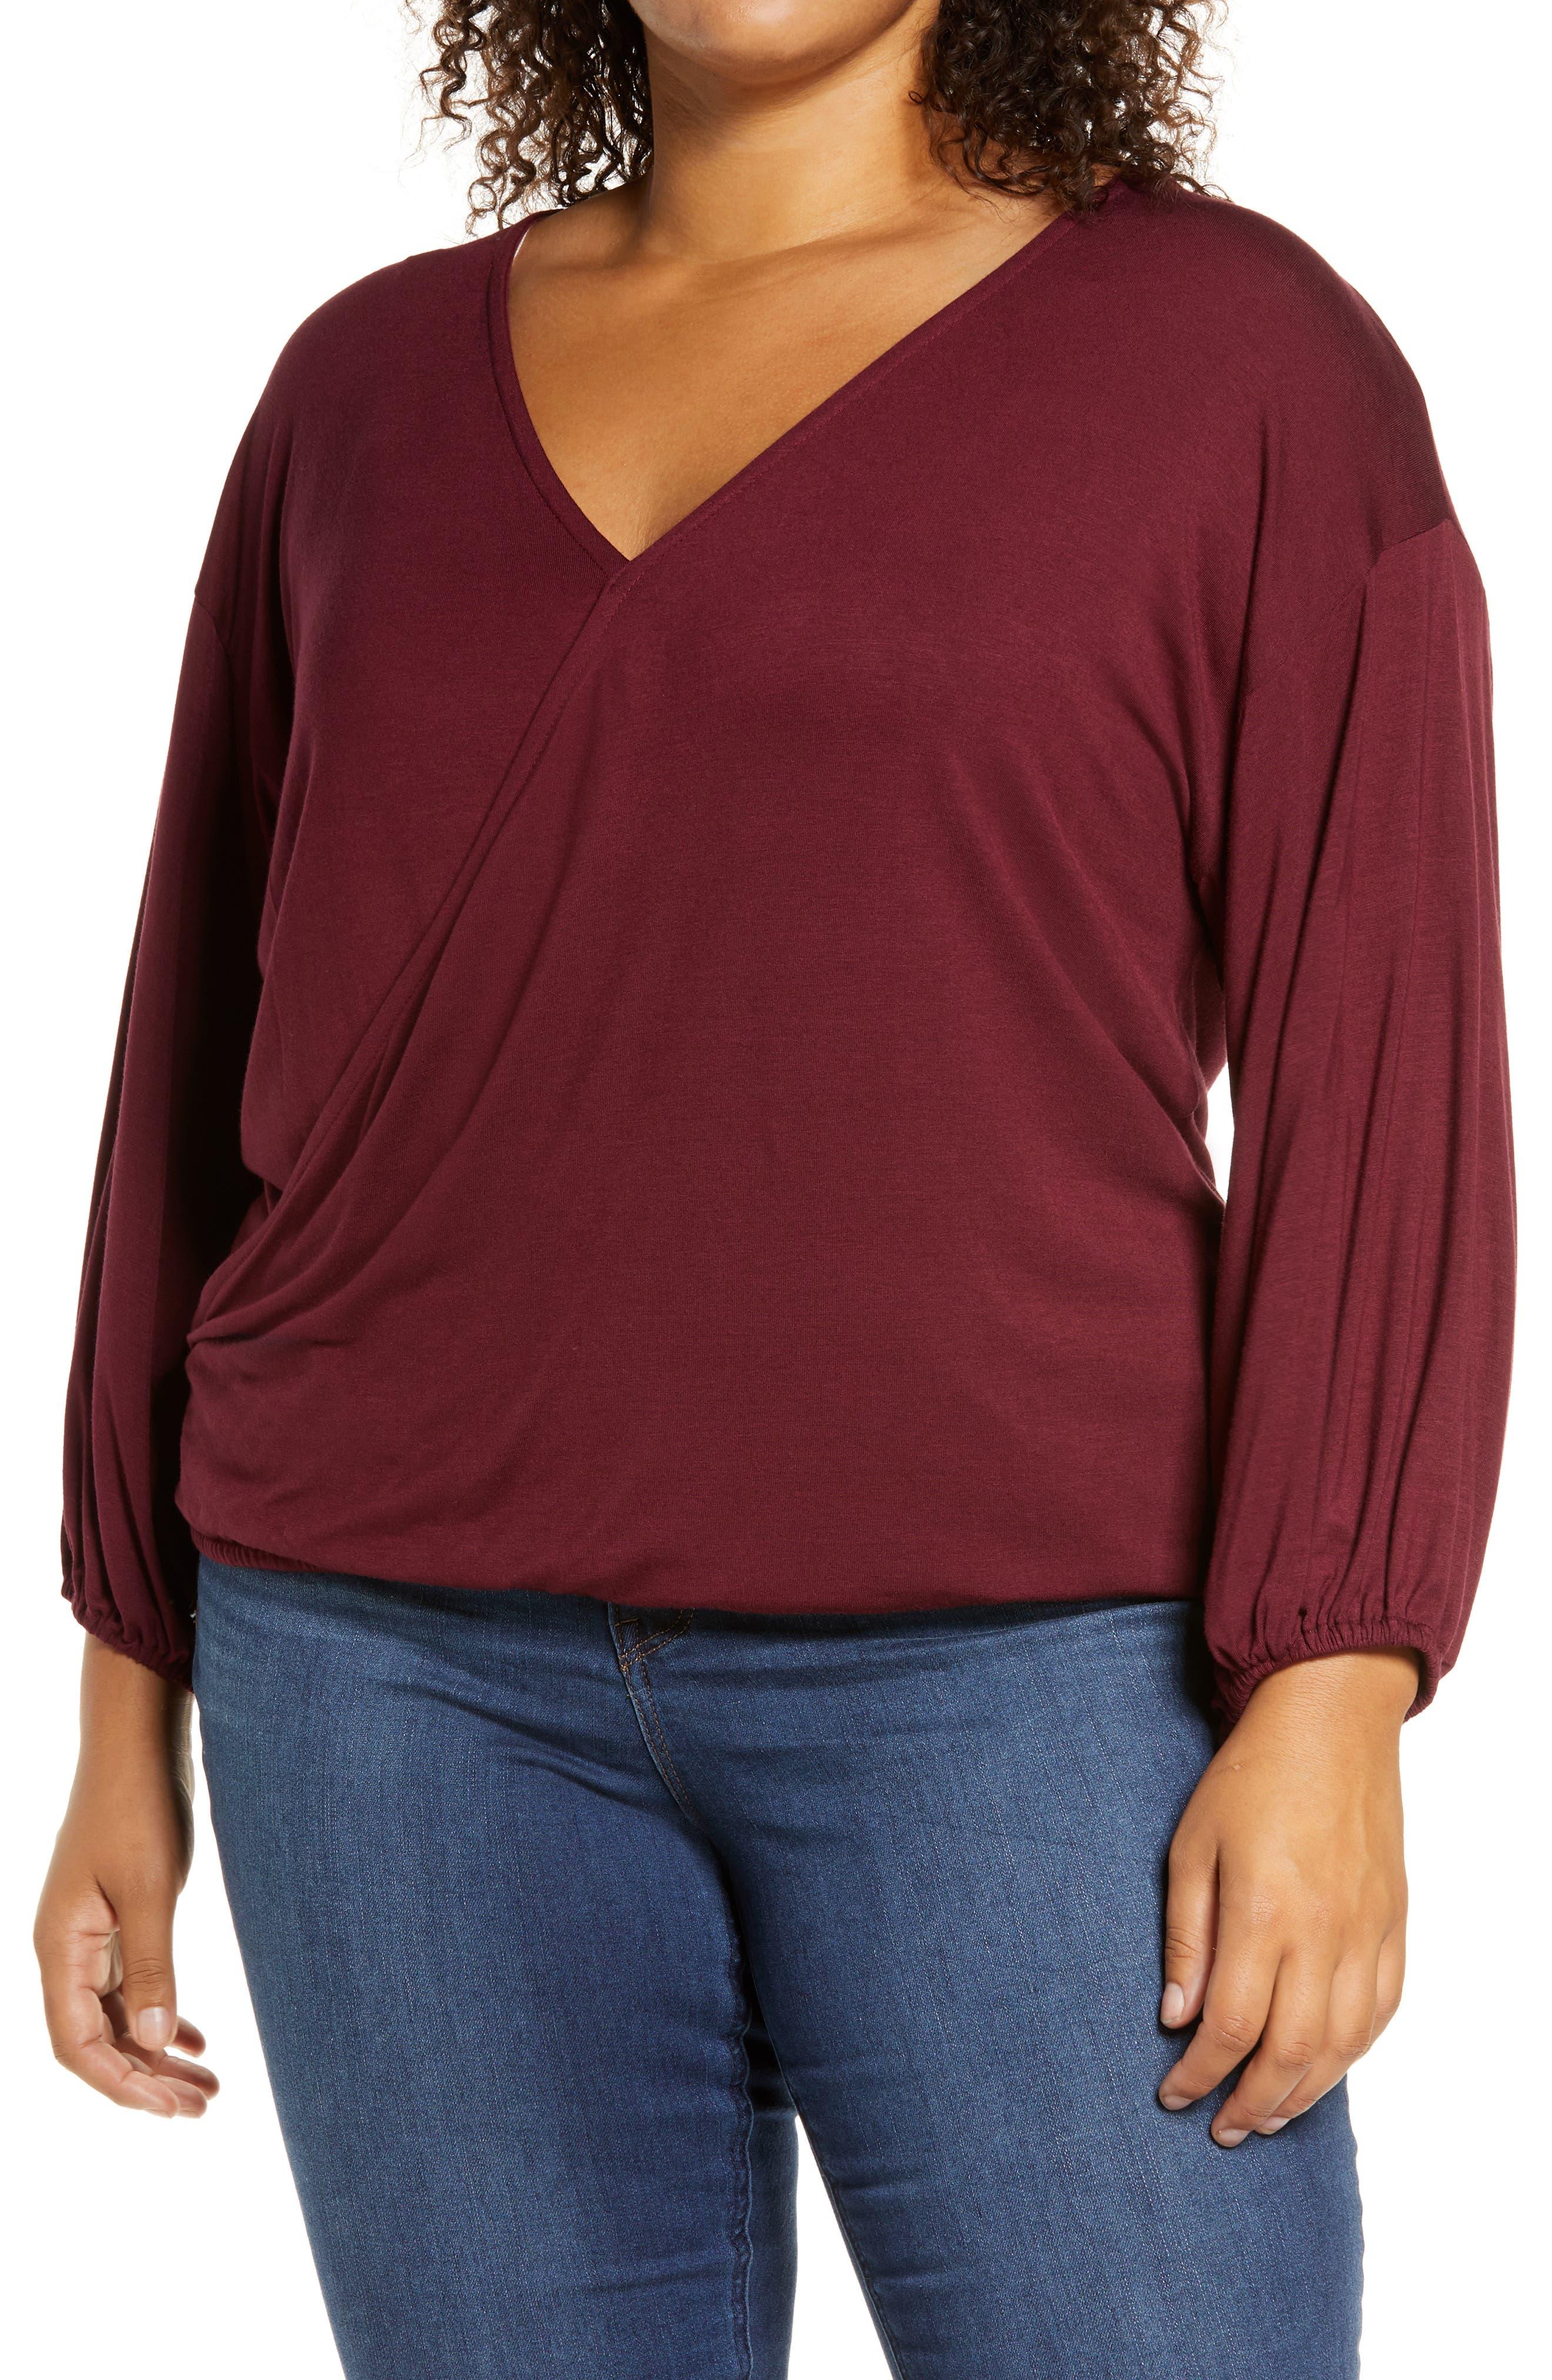 Plus Size Women's Loveapella Wrap Front Blouson Top